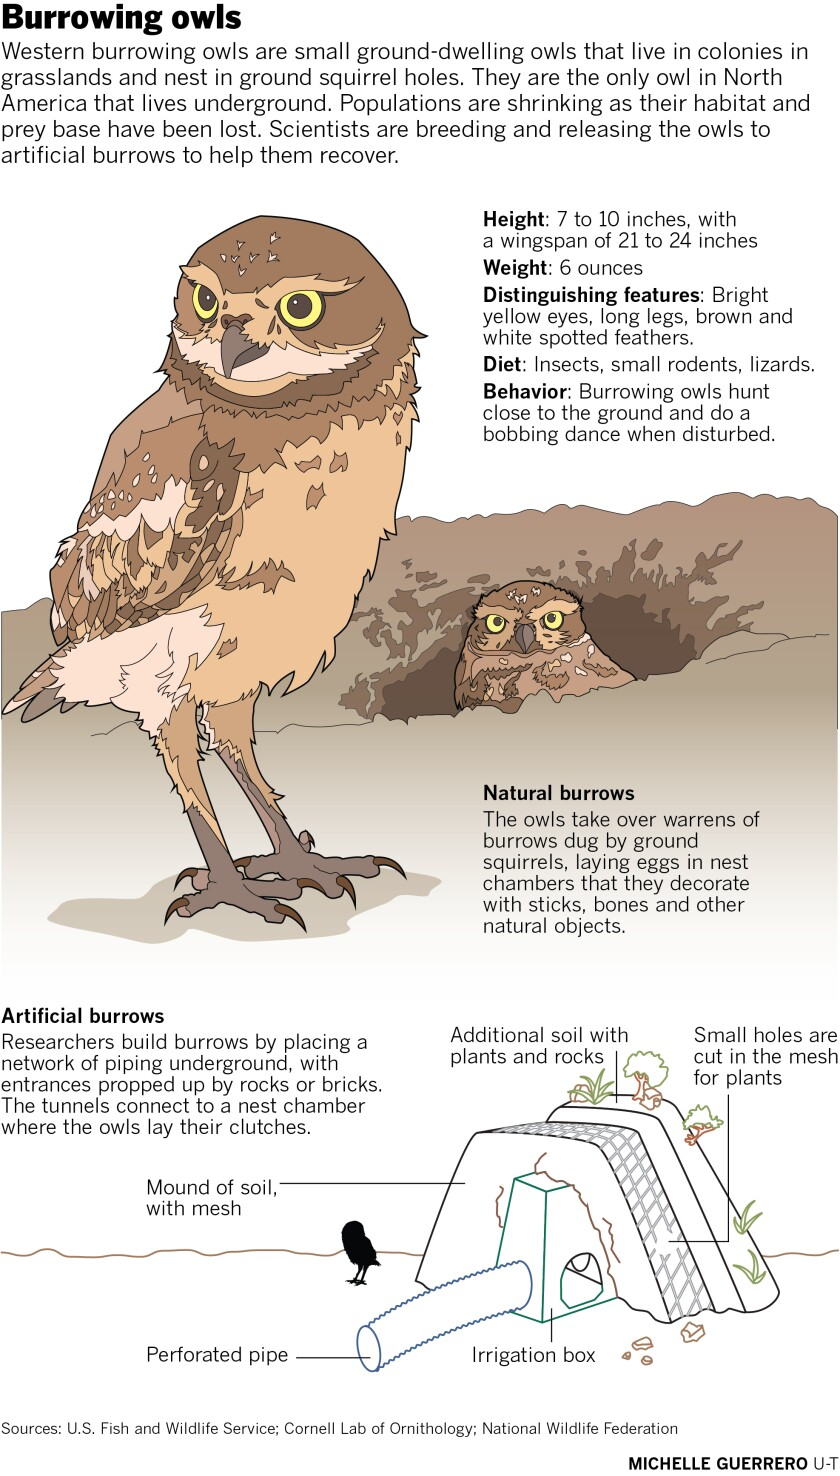 489180-w1-sd-me-western-burrowing-owl.jpg